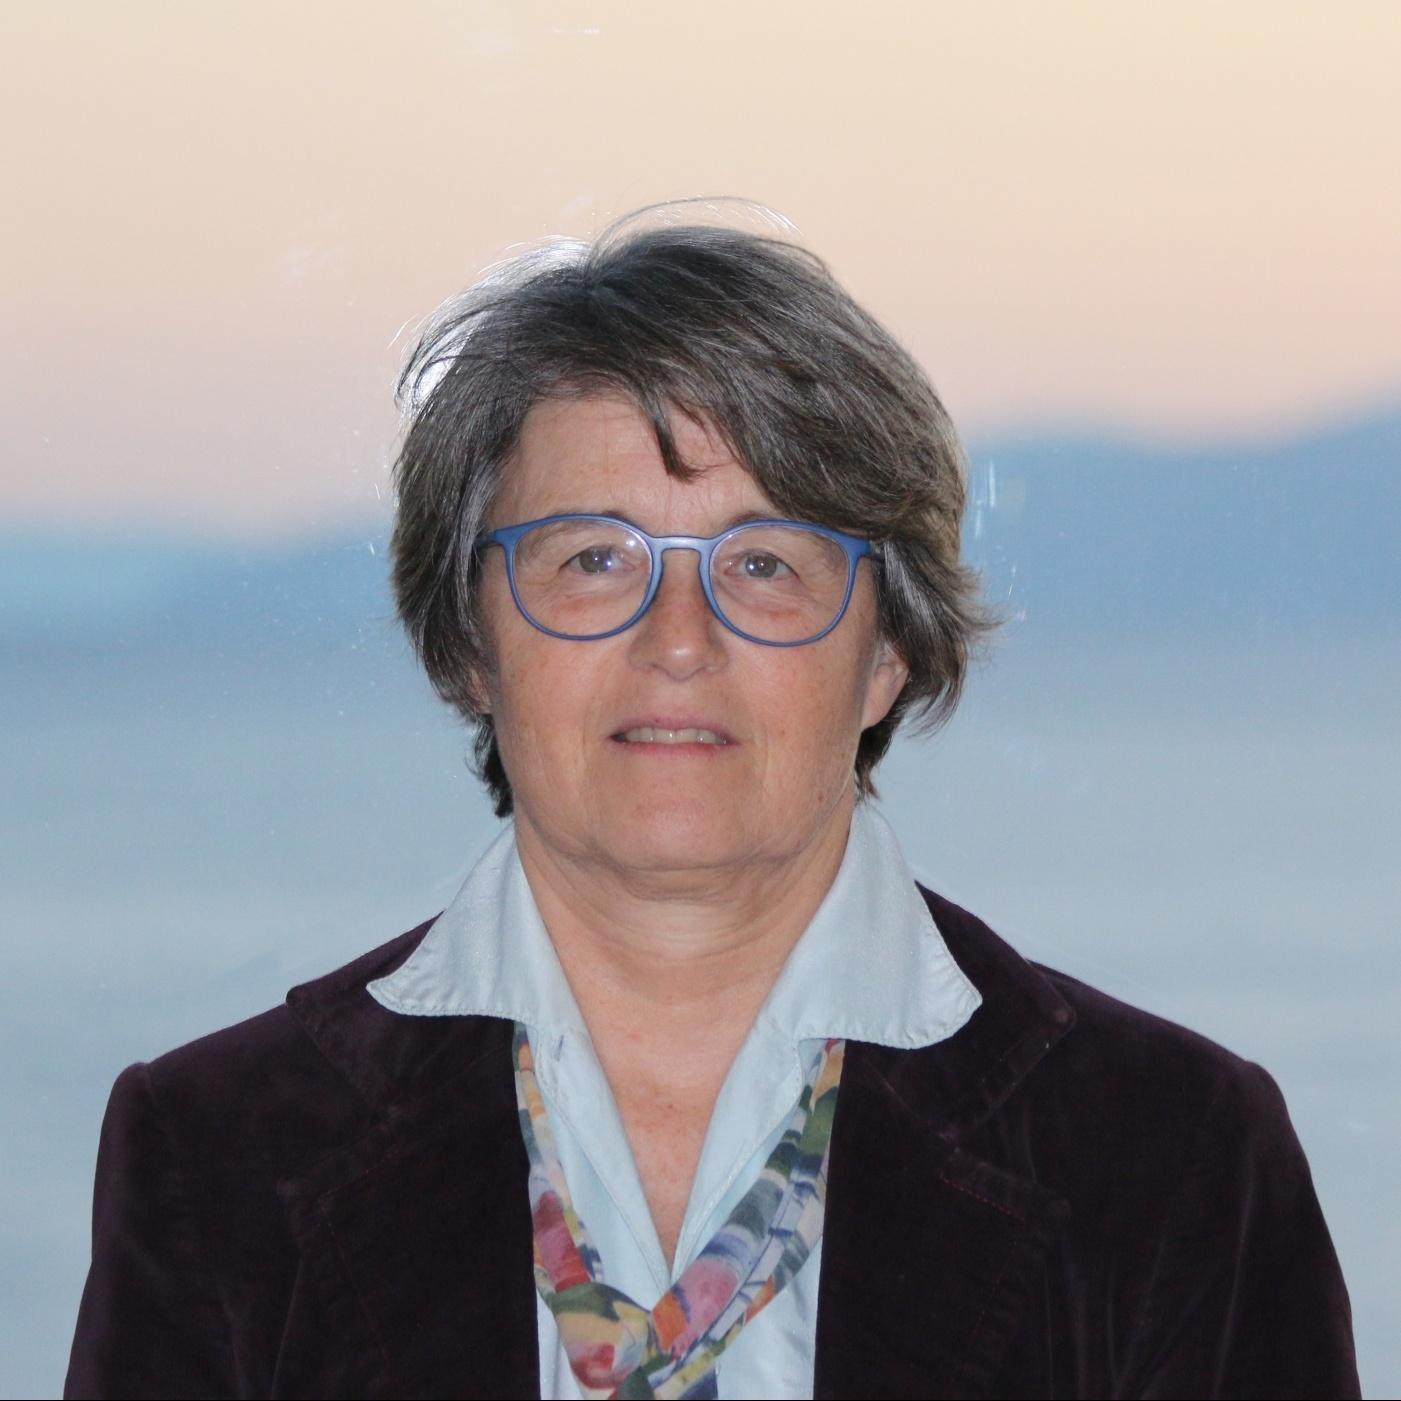 Sabina Passamonti